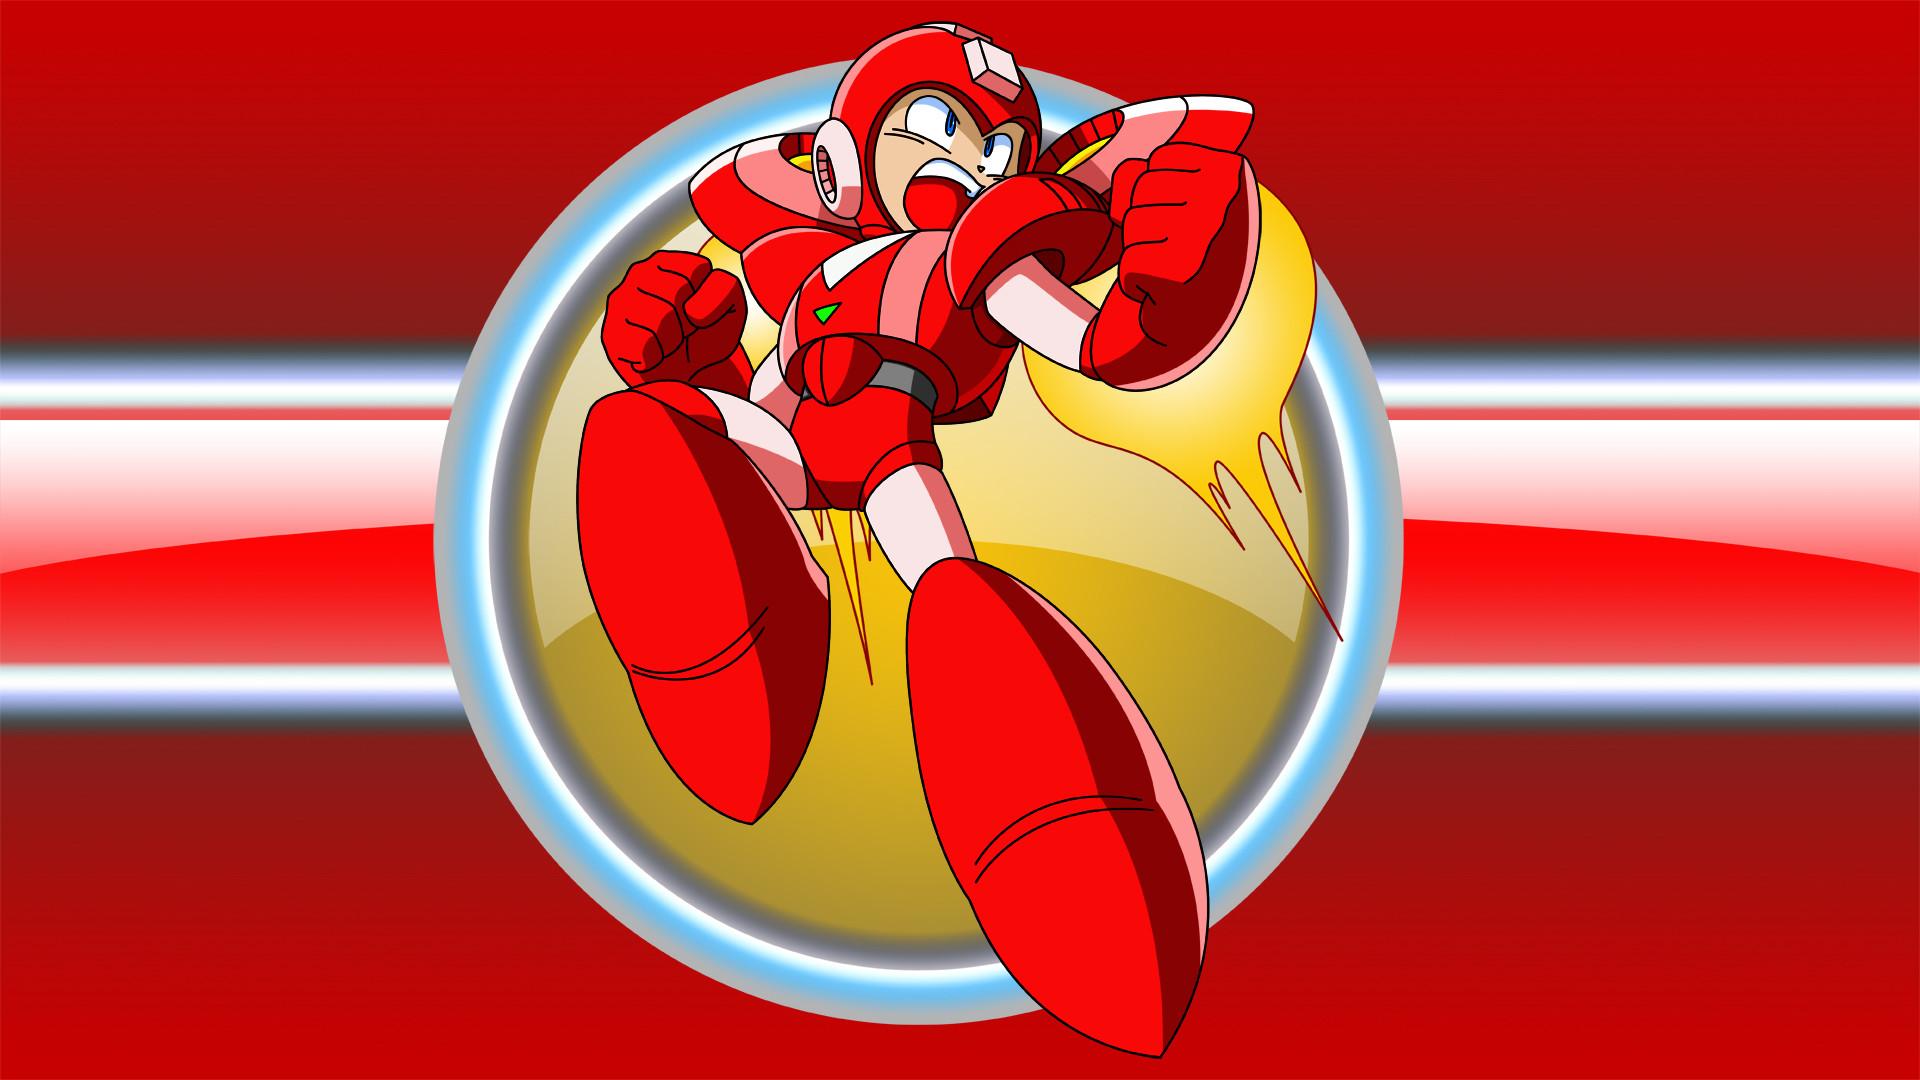 Red Megaman Jet Desktop Wallpaper